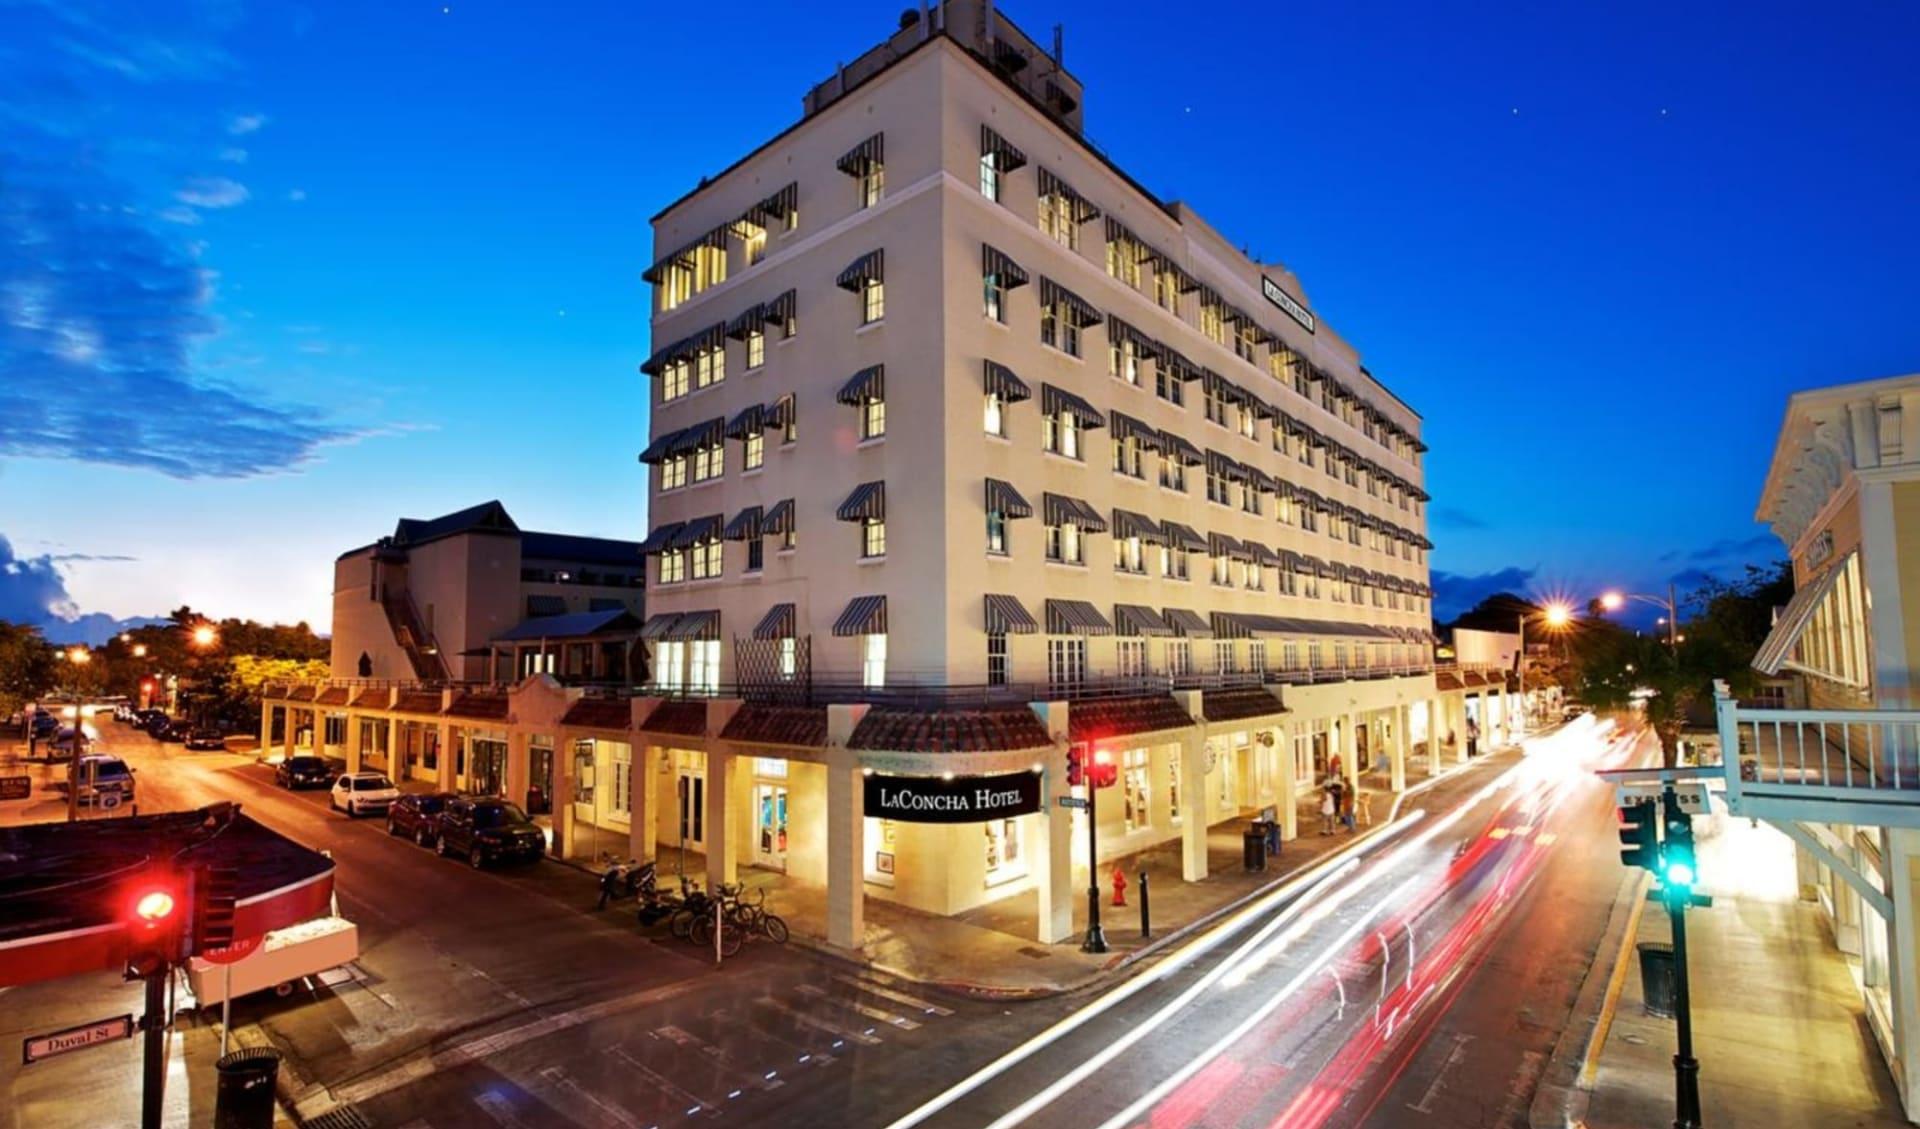 La Concha Hotel & Spa in Key West:  Crowne Plaza La Concha_Aussenansicht